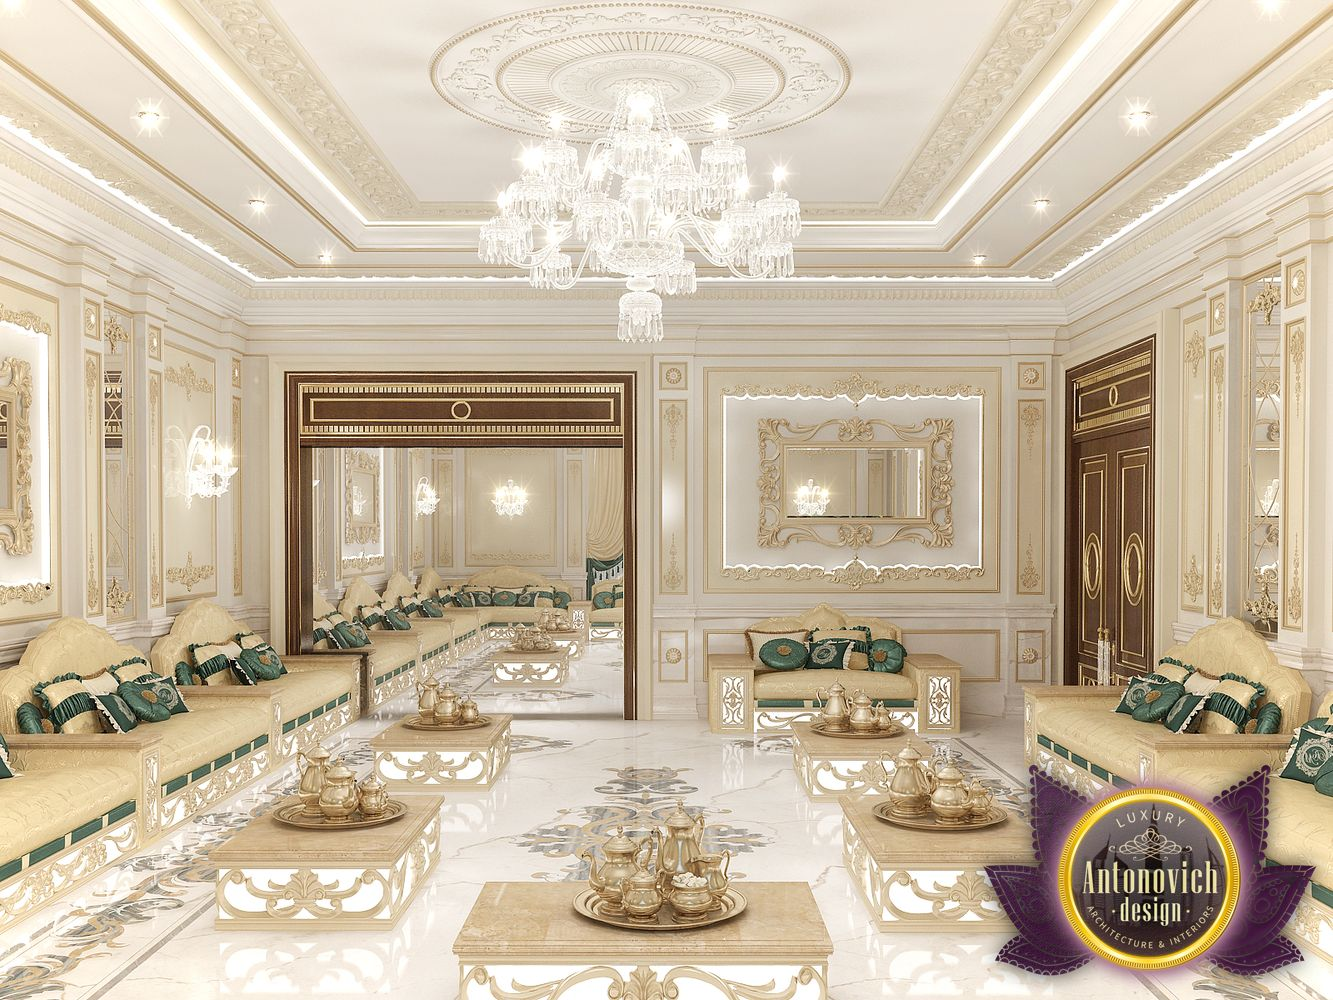 home theatre sofas india buy sofa from china nigeiradesign: arabic majlis interior design luxury ...